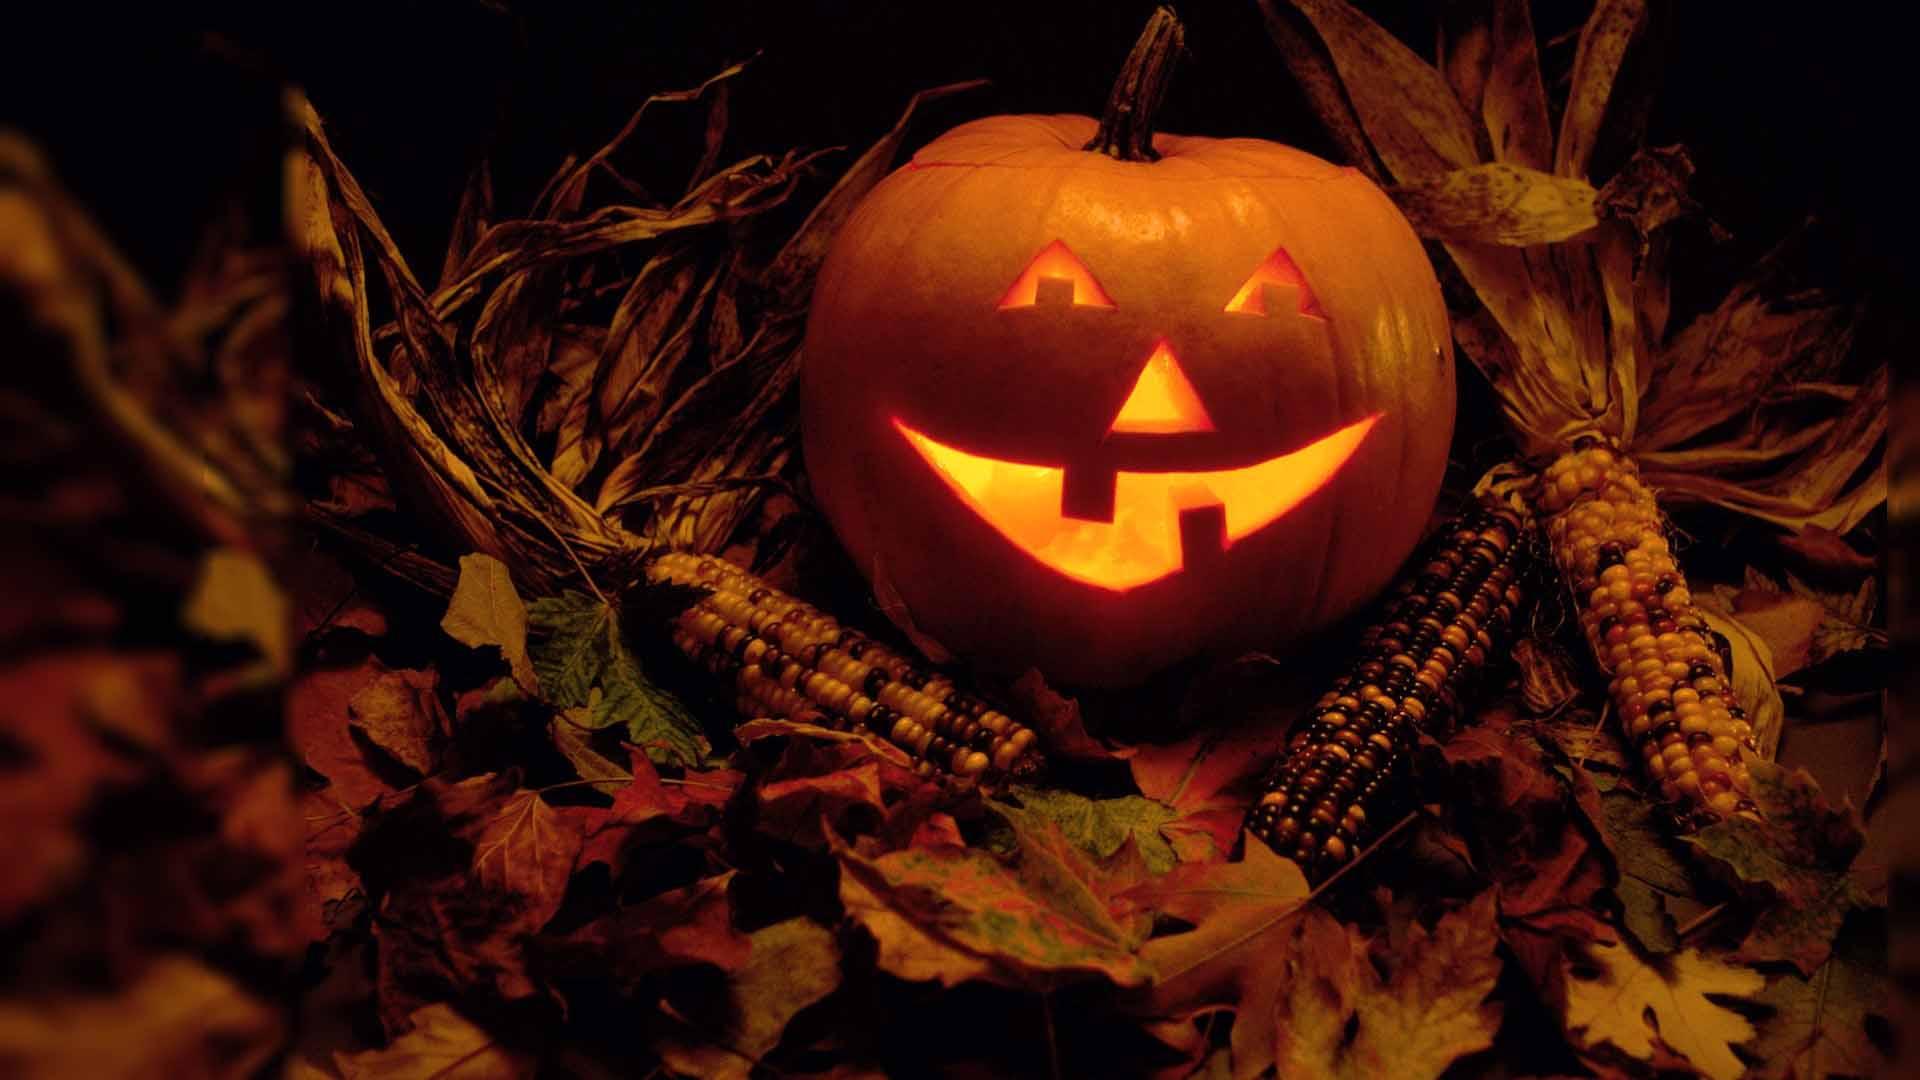 Halloween-wallpapers-HD-jack-o-lantern-wide